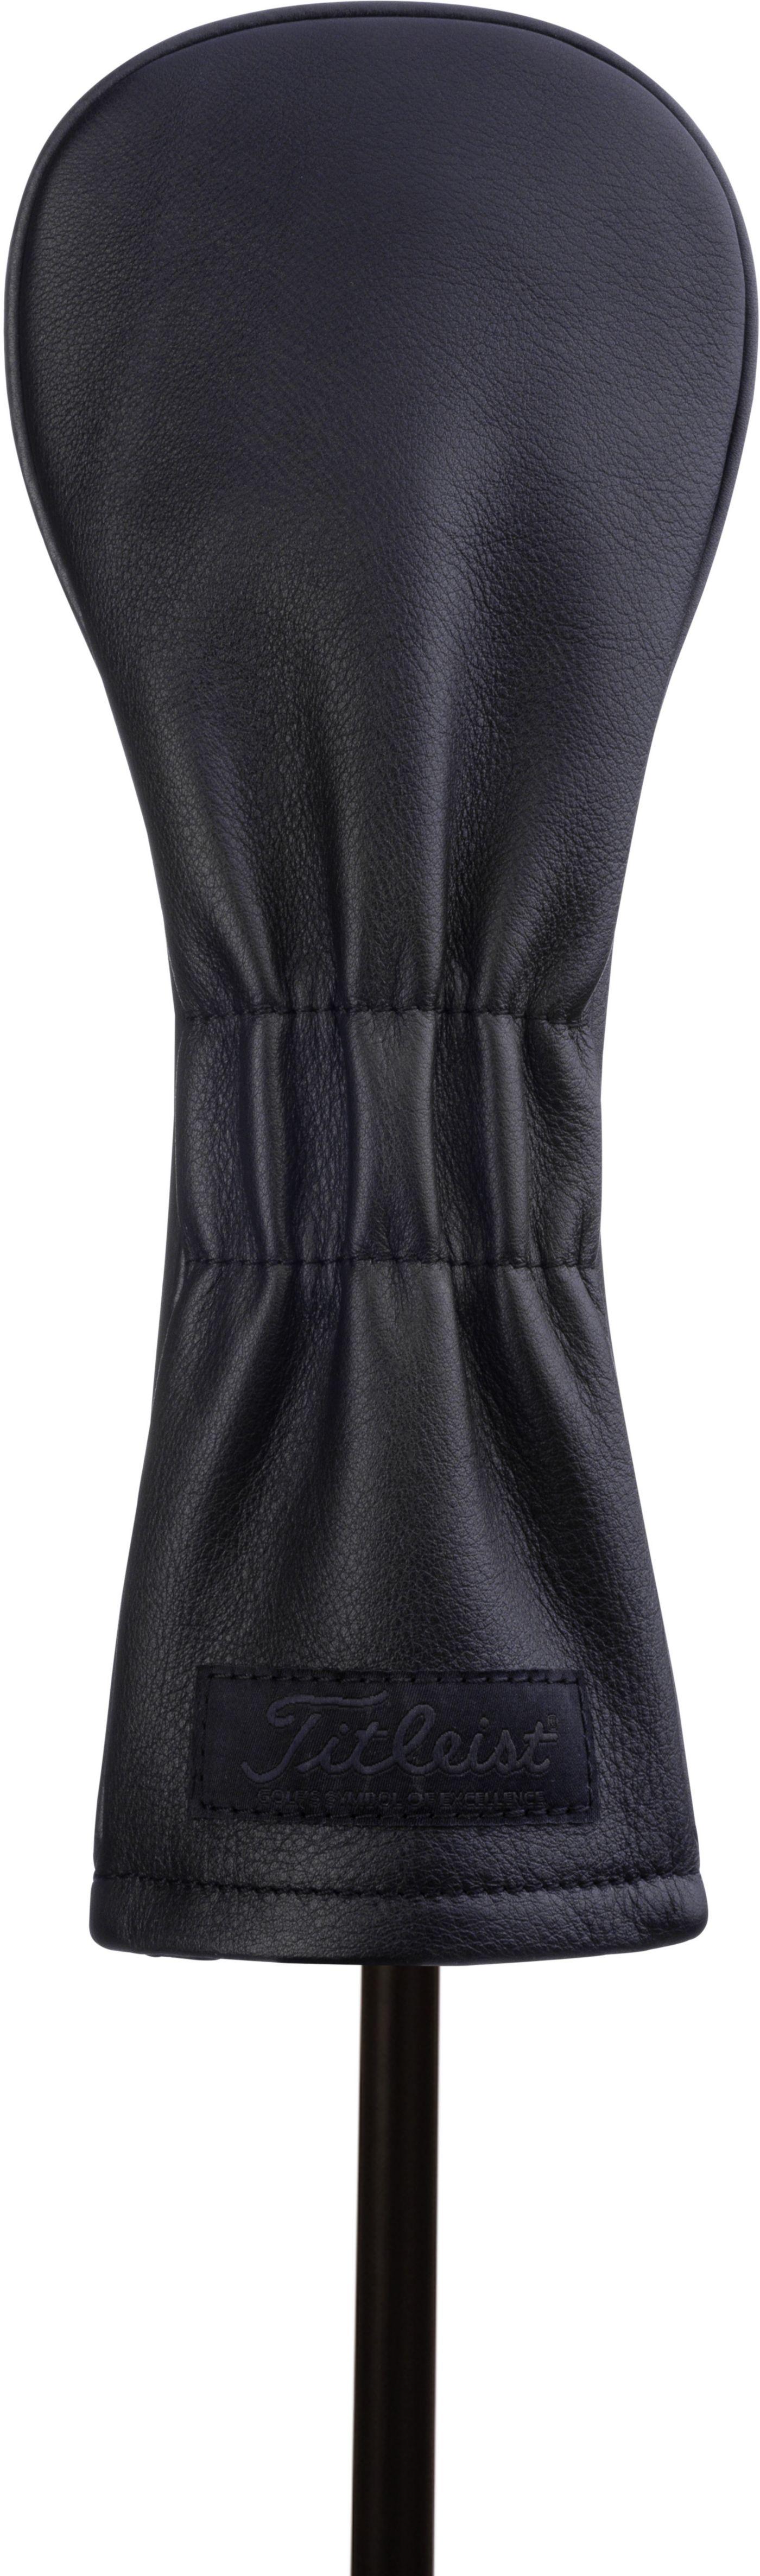 Titleist Noir Leather Fairway Wood Headcover